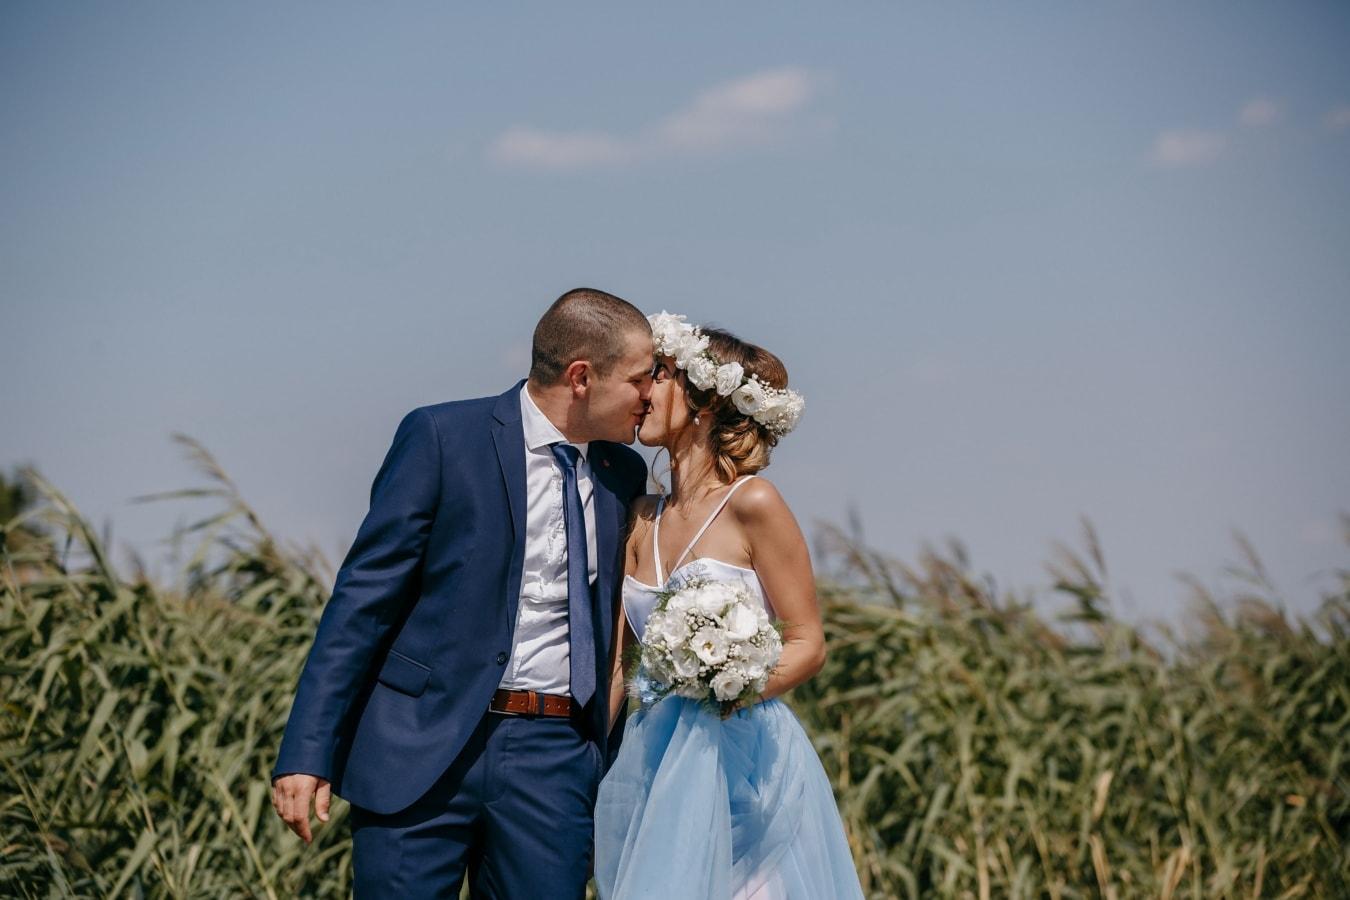 romantic, kiss, pretty girl, hugging, man, love, nature, bride, romance, summer